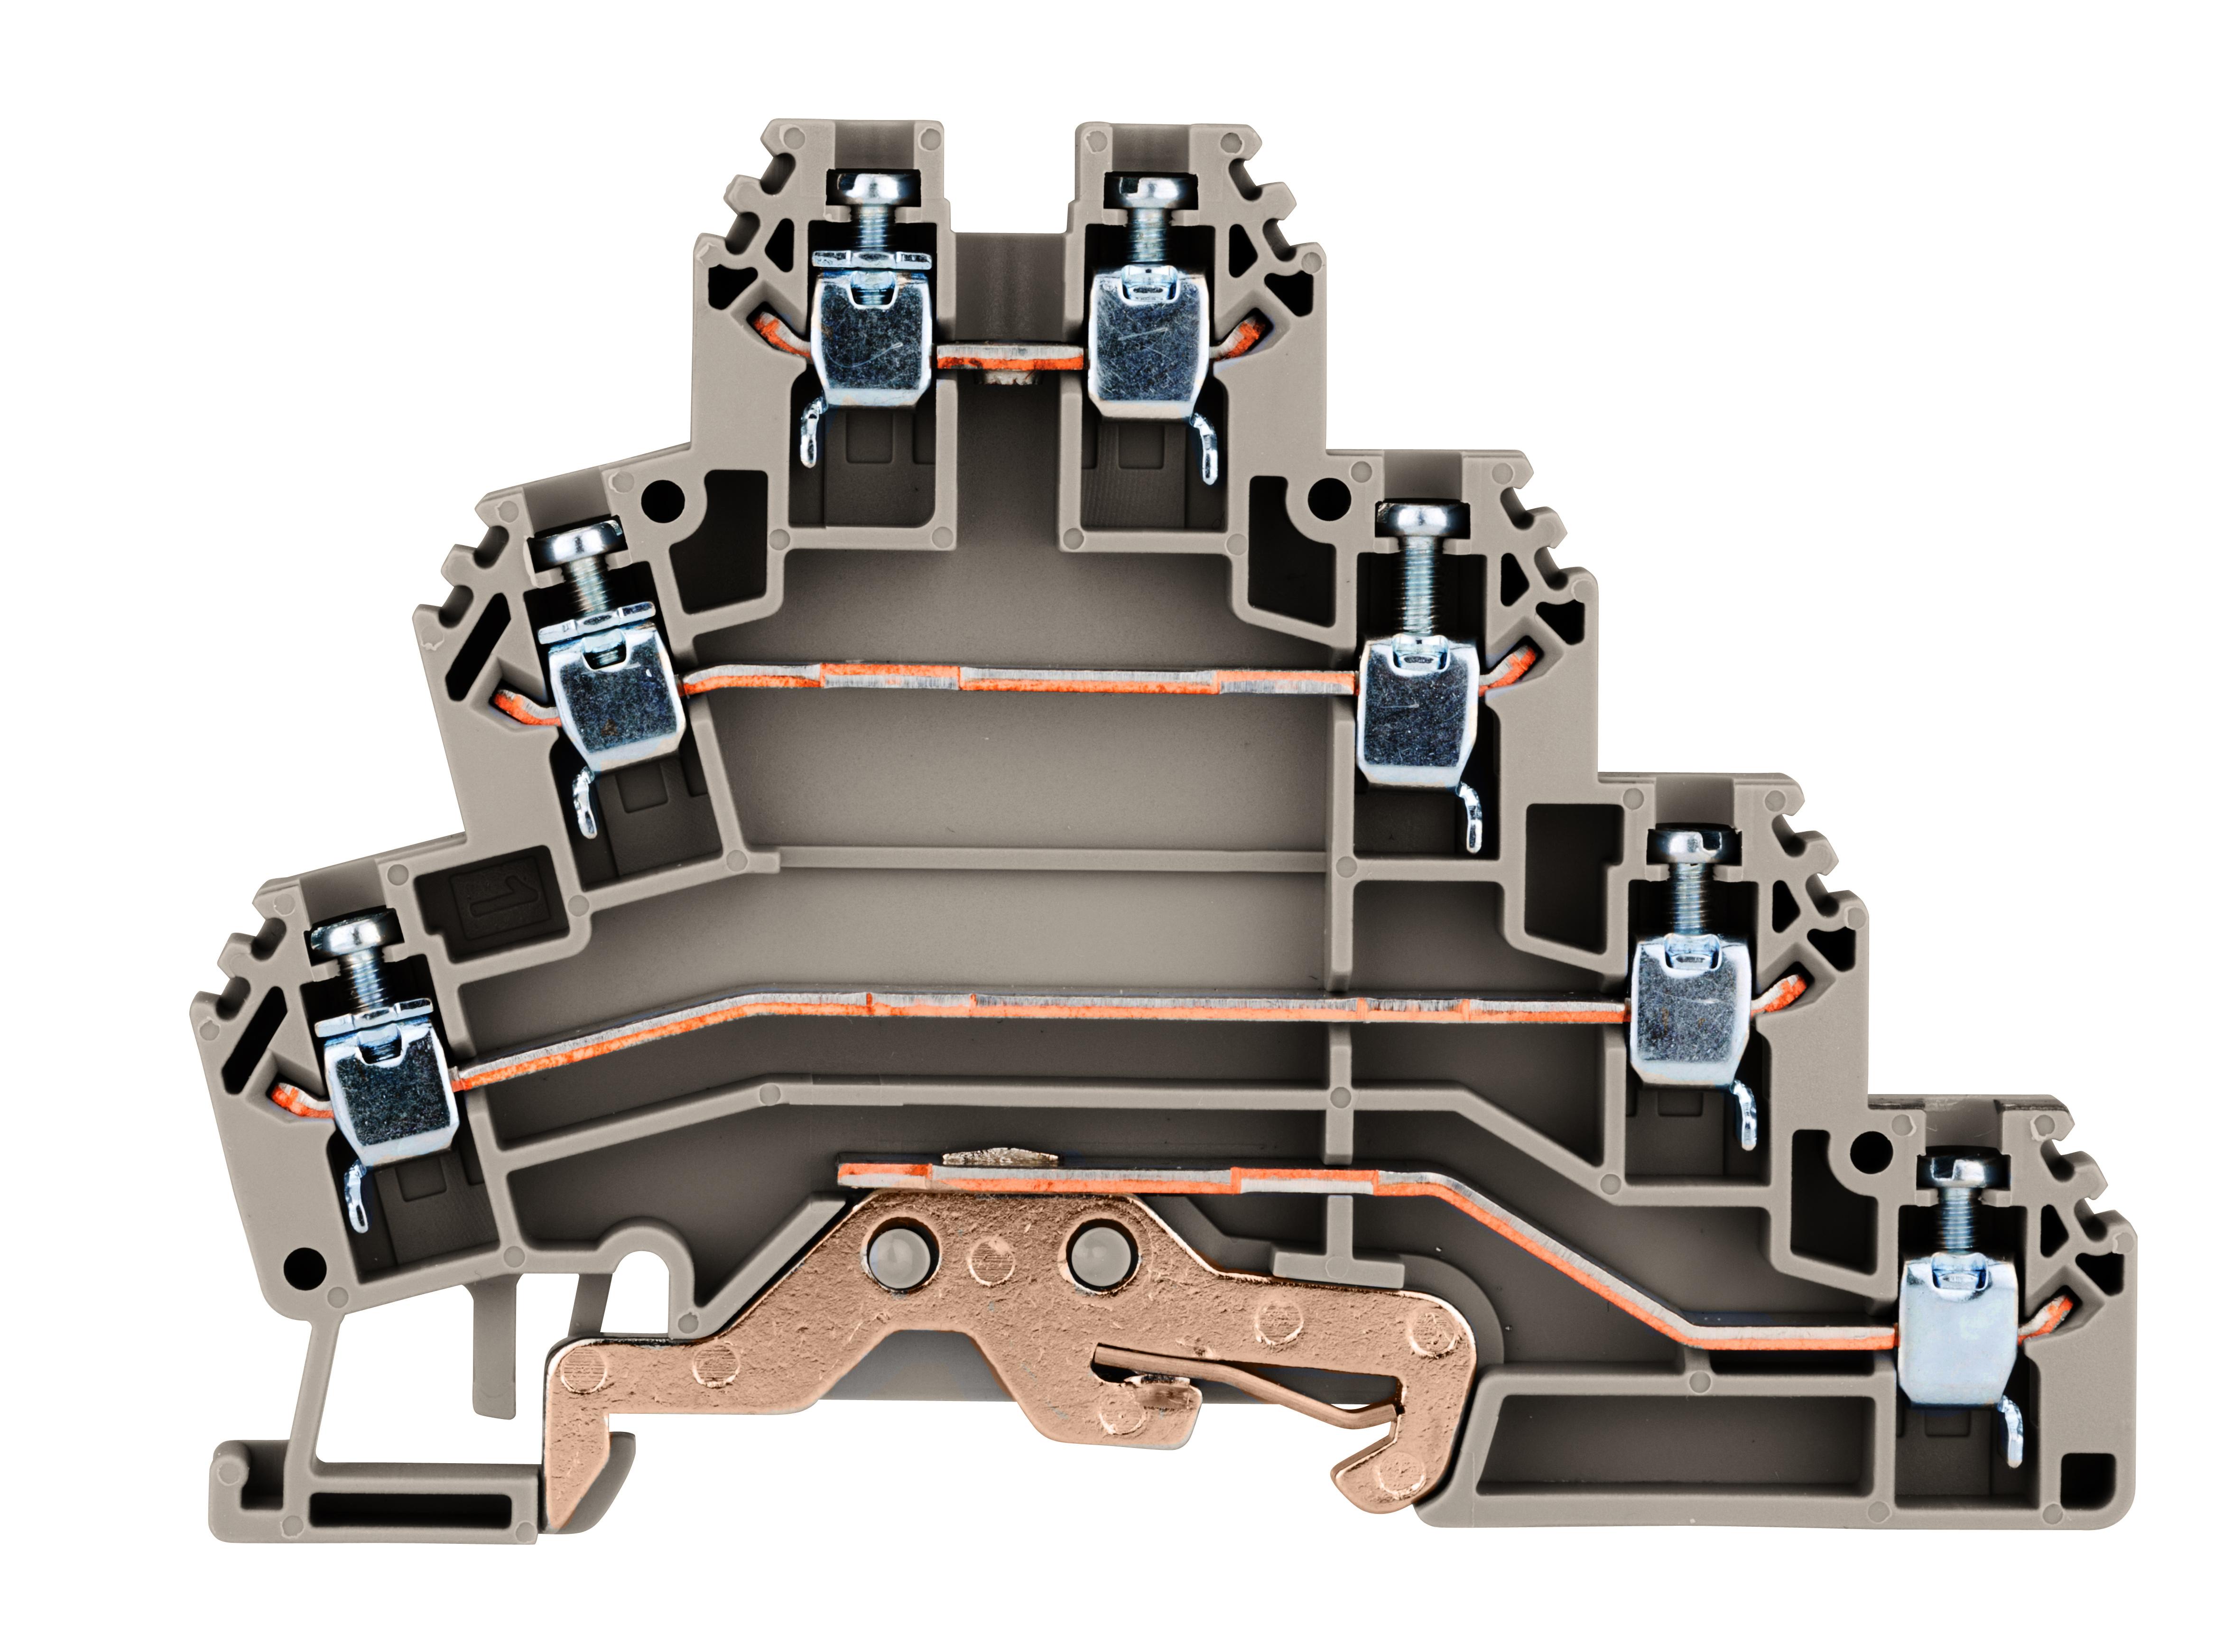 1 Stk Installations-Dreistockklemme 2,5mm², Type PUK3T, 3P+PE IK680003--